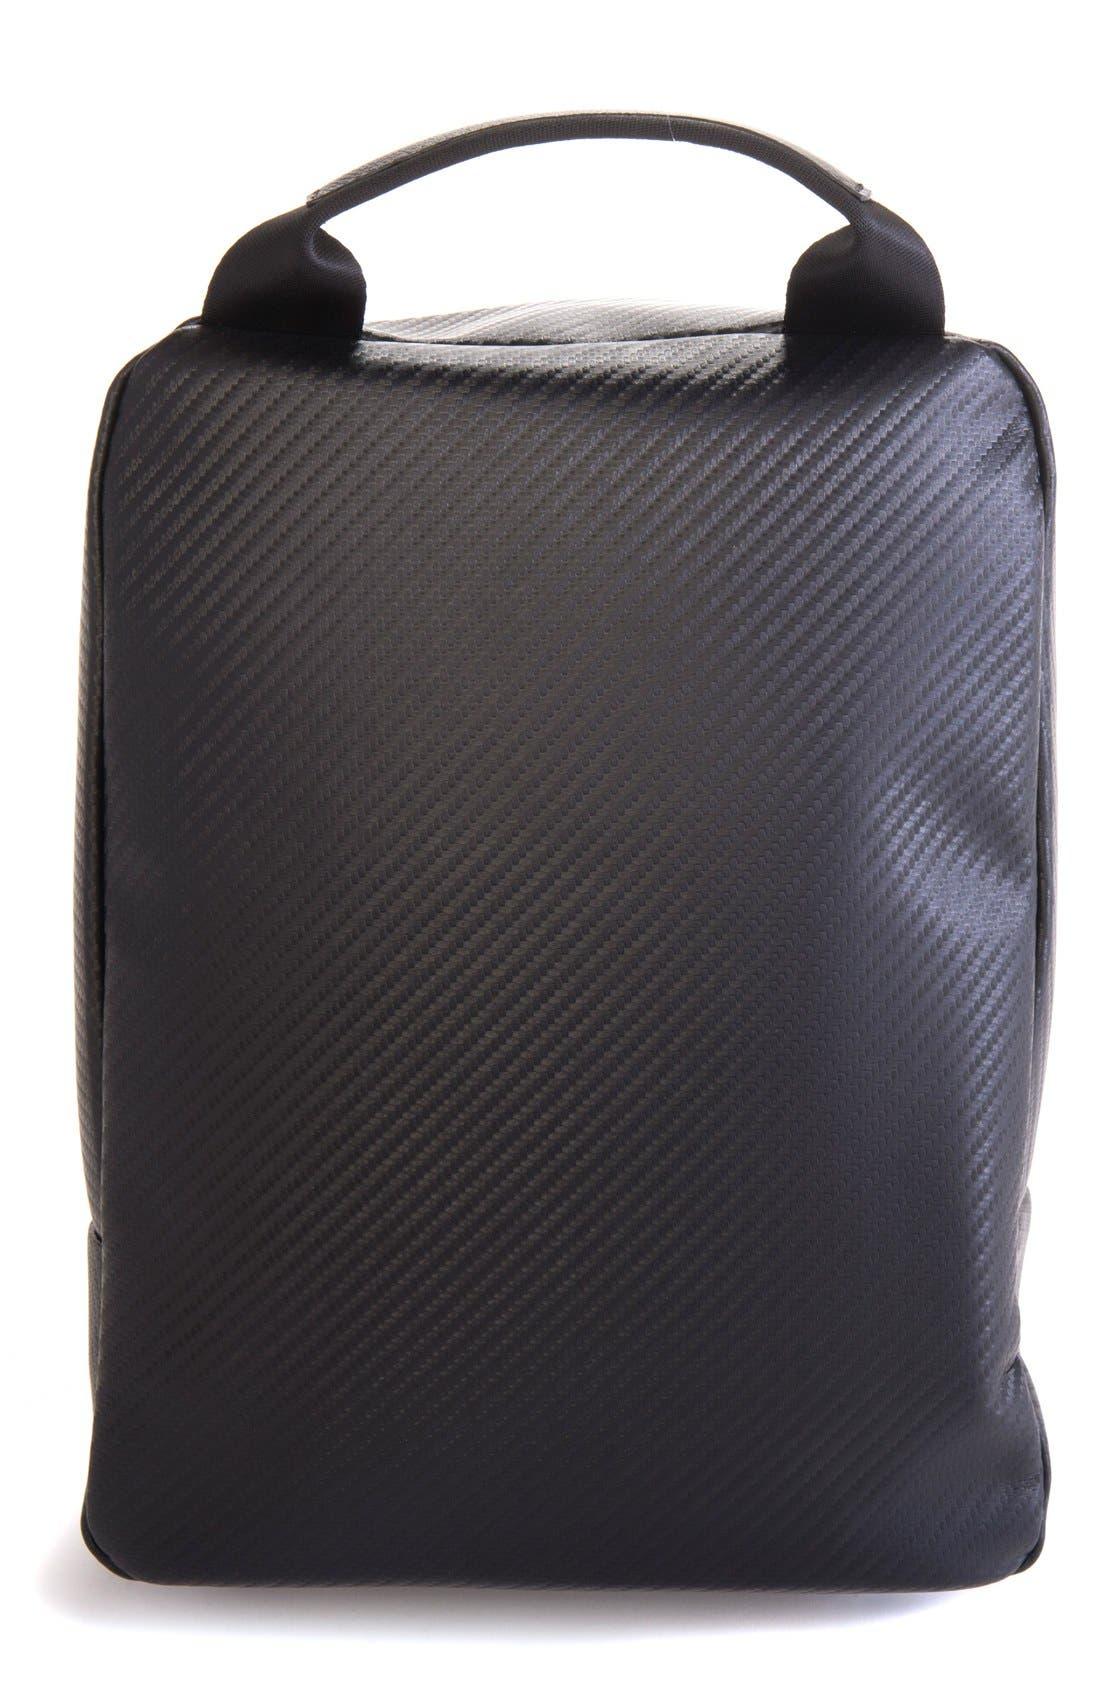 Alternate Image 2  - Vessel Pebbled Faux Leather Shoe Bag